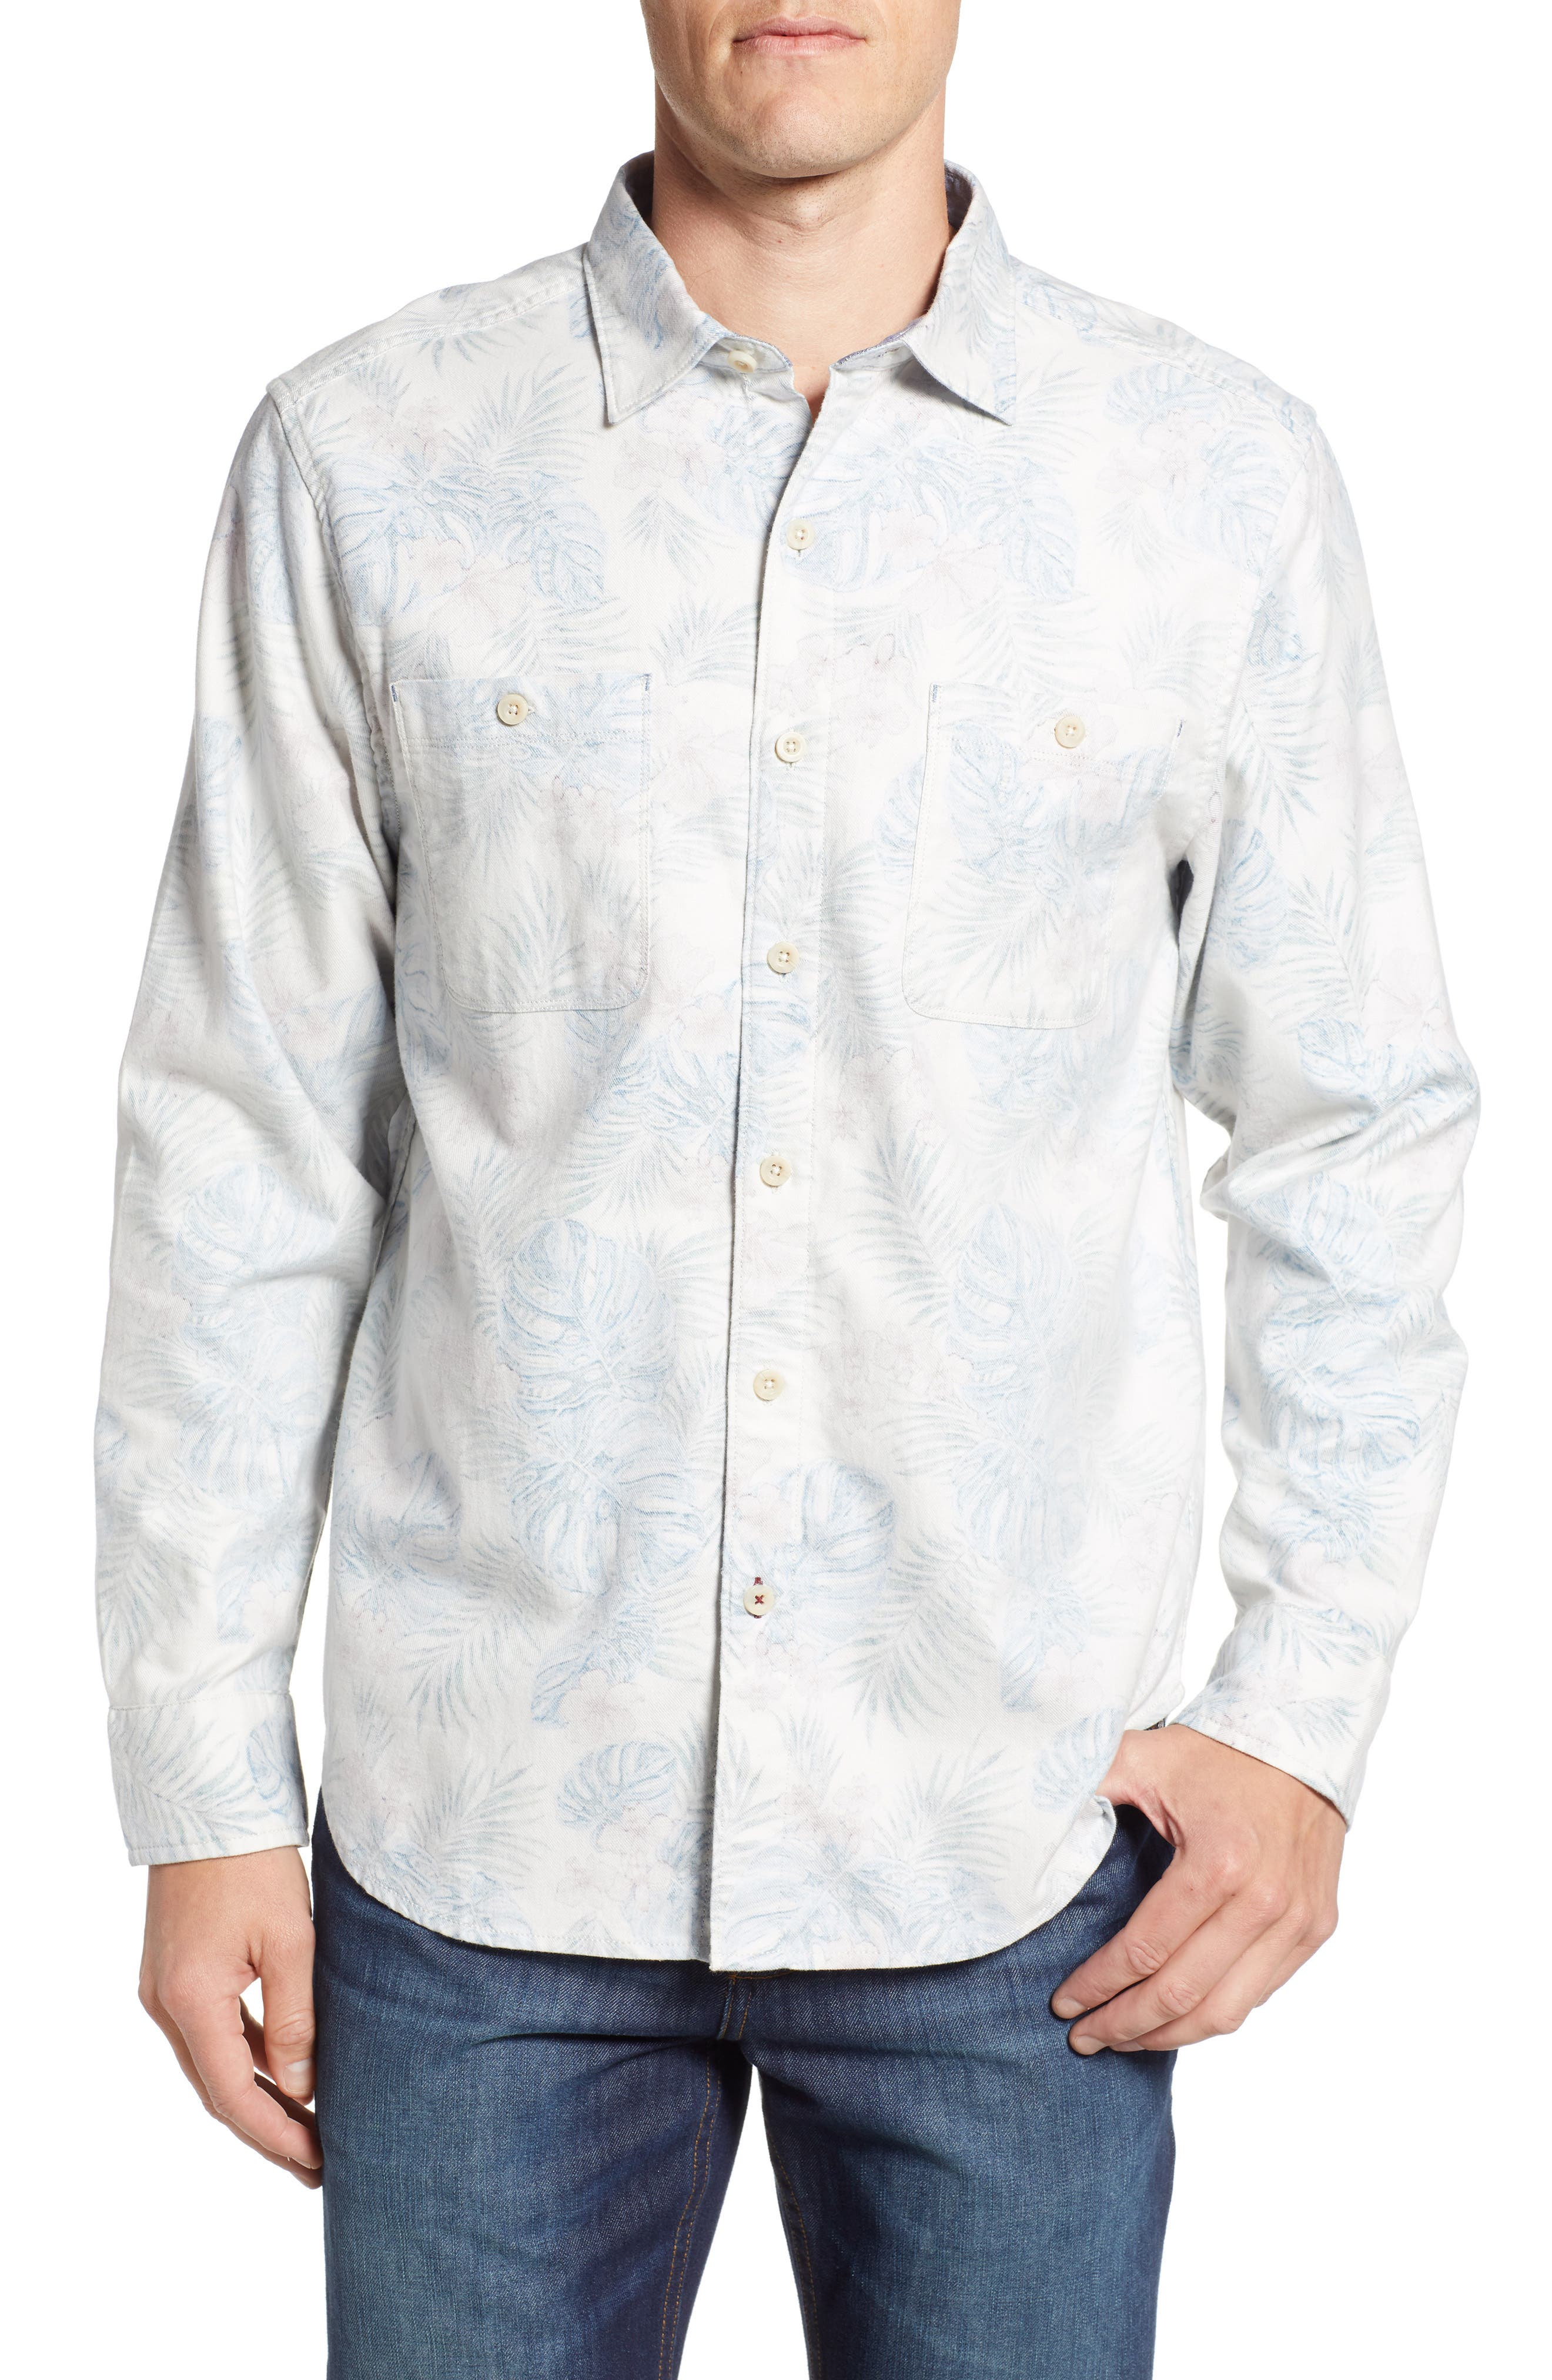 TOMMY BAHAMA, Beach Palms Long Sleeve Flannel Sport Shirt, Main thumbnail 1, color, 200